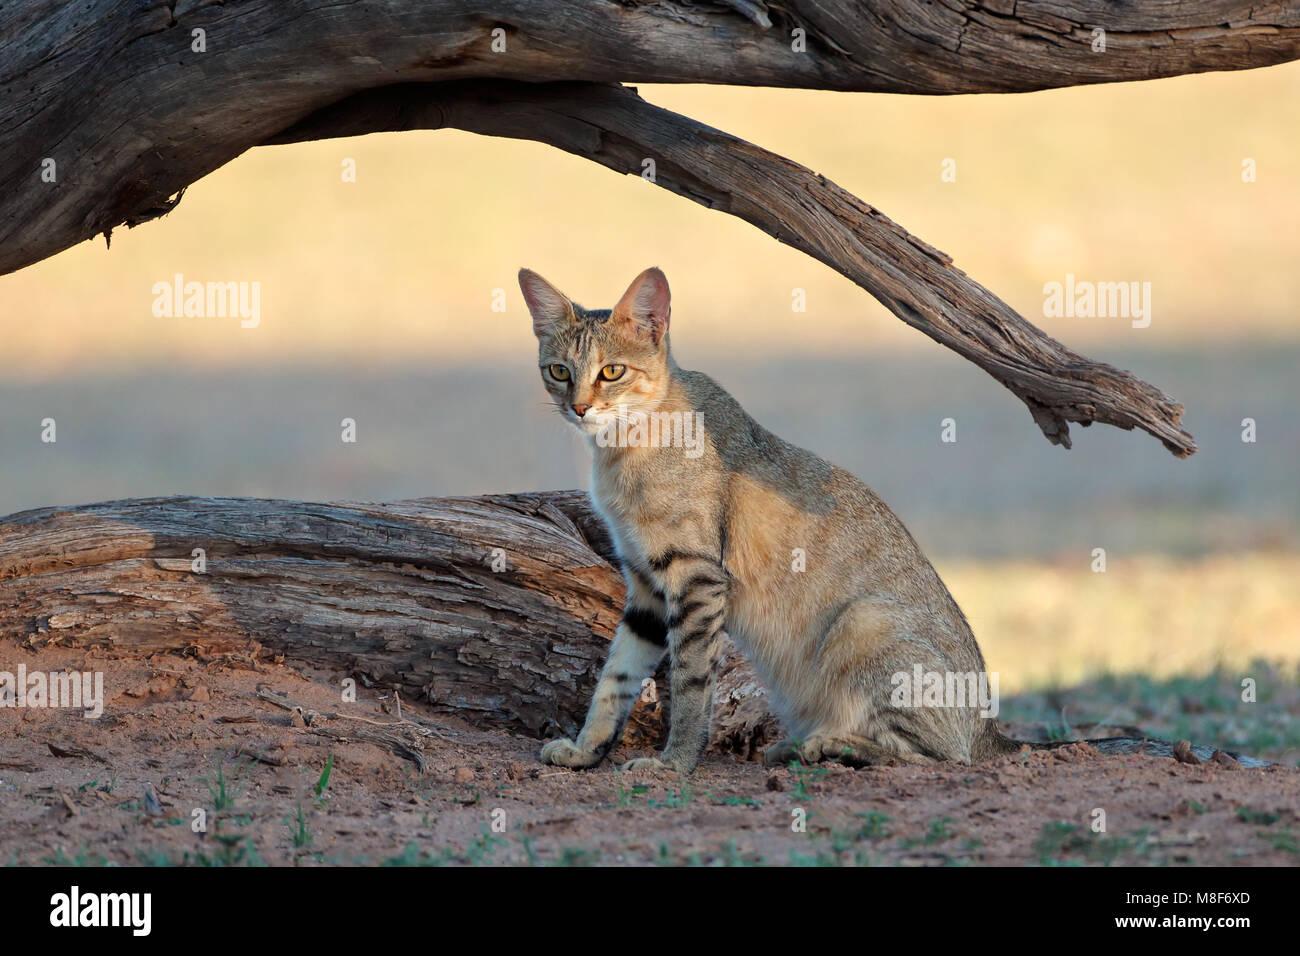 An African wild cat (Felis silvestris lybica), Kalahari desert, South Africa Stock Photo